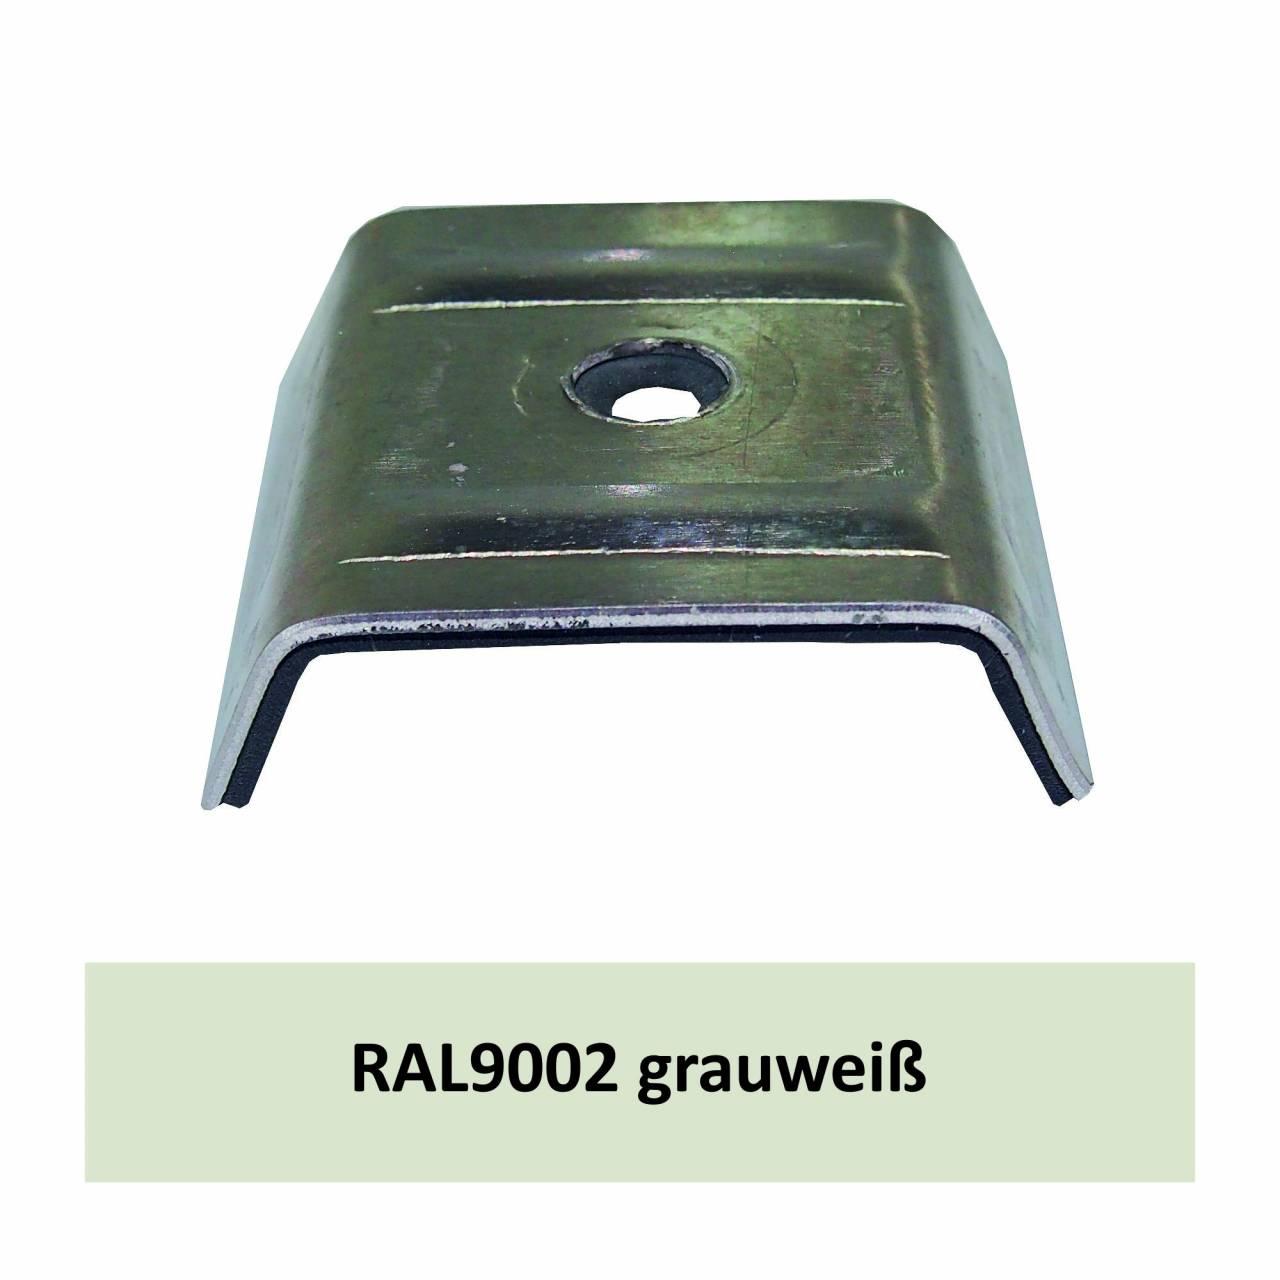 Kalotten für Kingspan, Alu RAL9002 grauweiß / Pck a 100 Stück